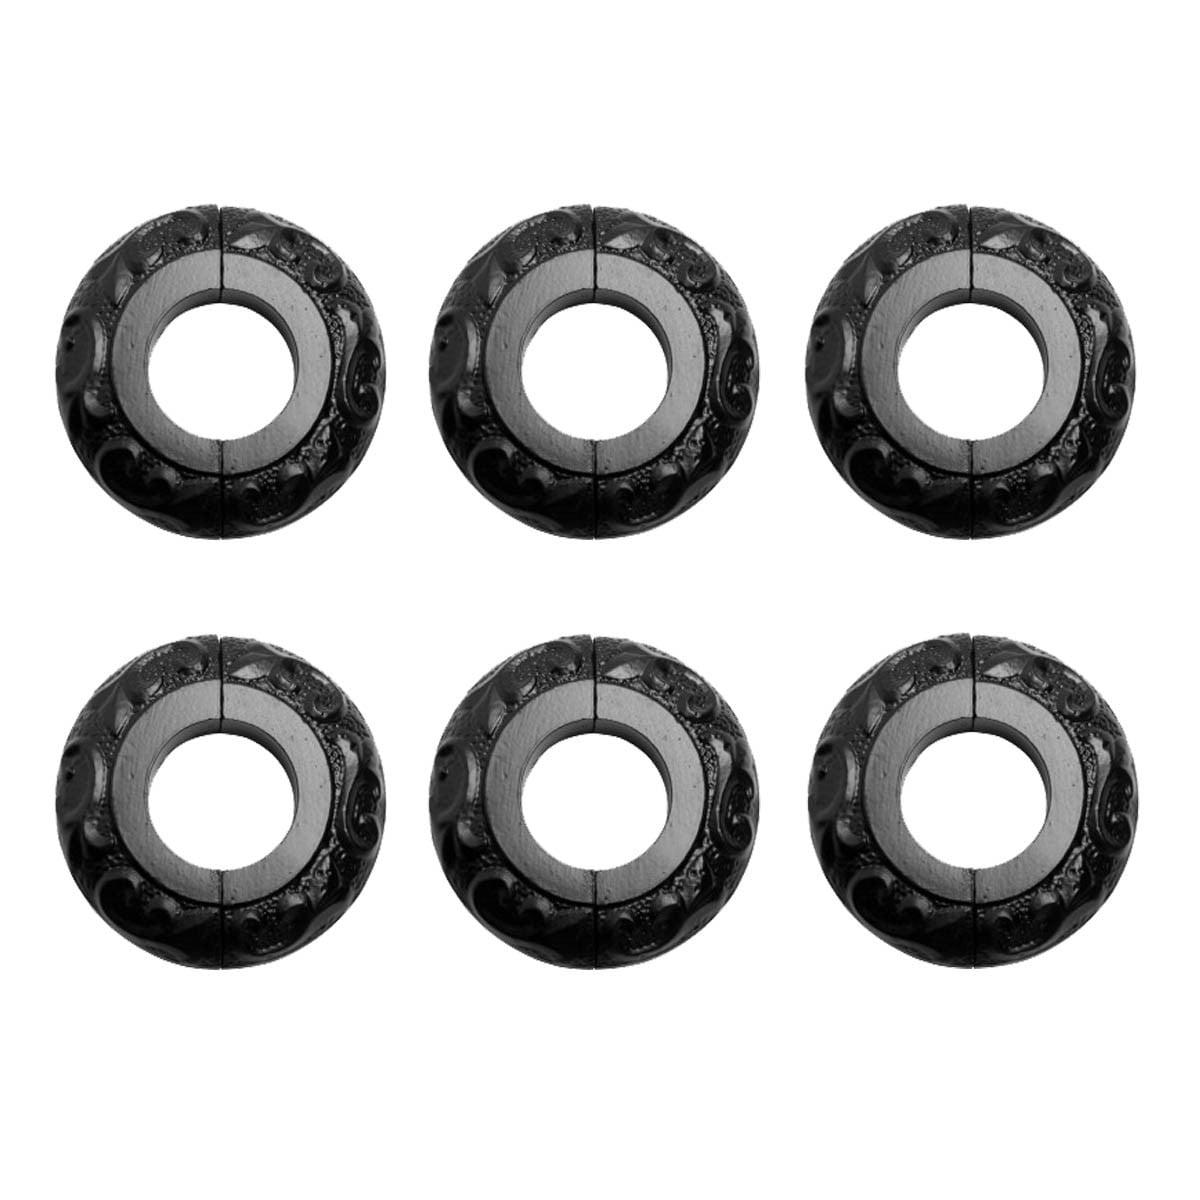 6 Radiator Flange Black Aluminum Escutcheon 1 1/4'' ID | Renovator's Supply